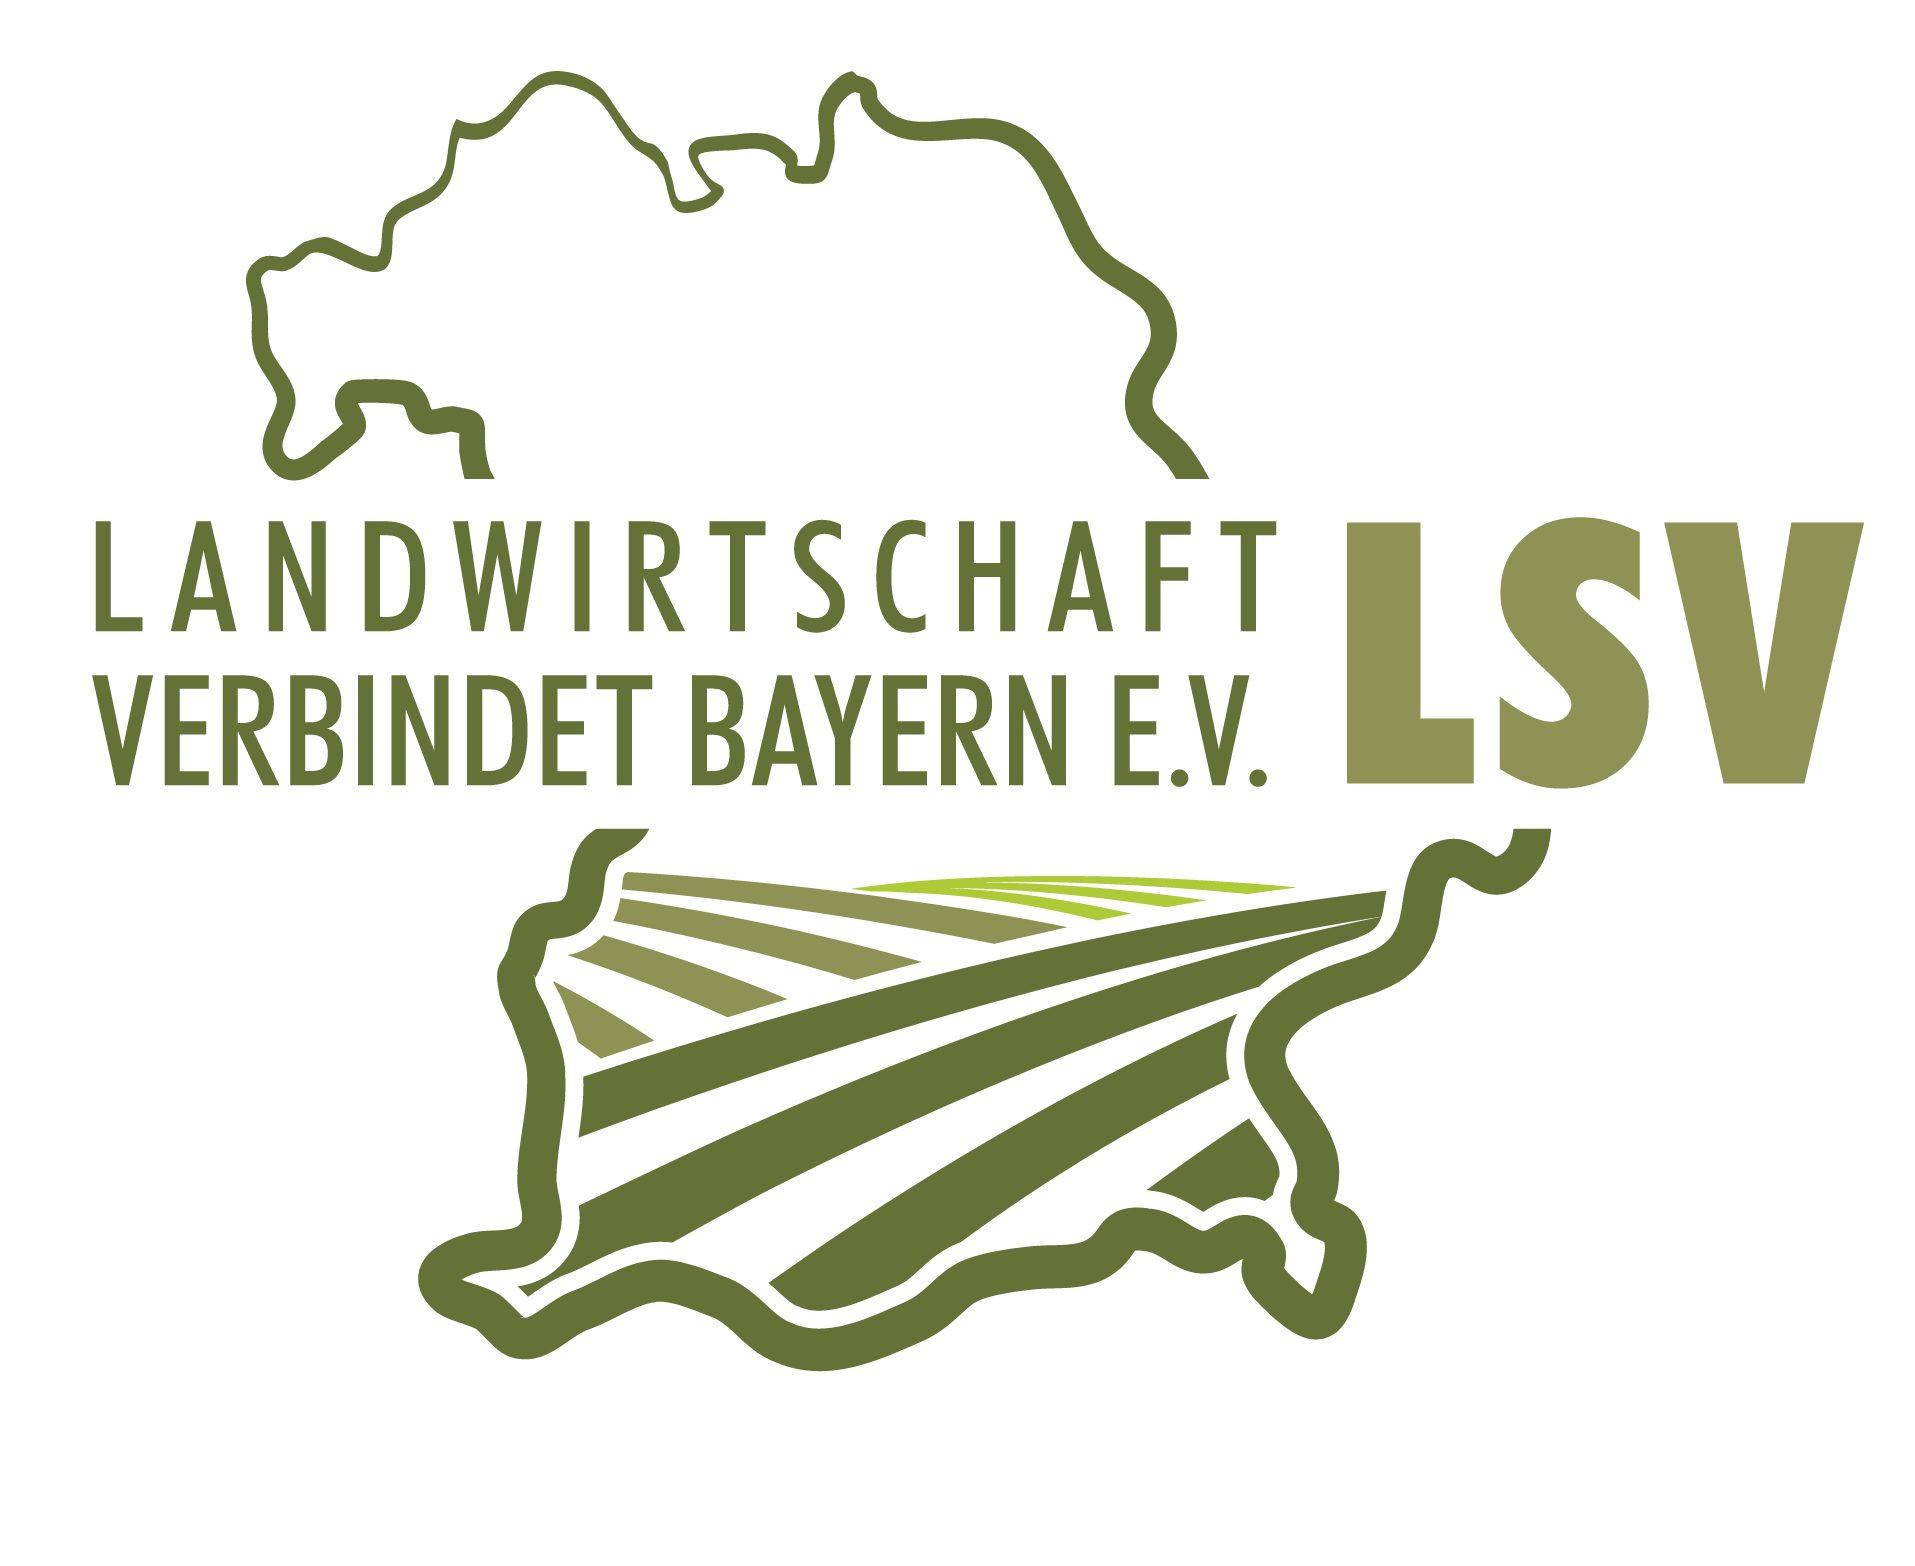 Landwirtschaft verbindet Bayern e.V.